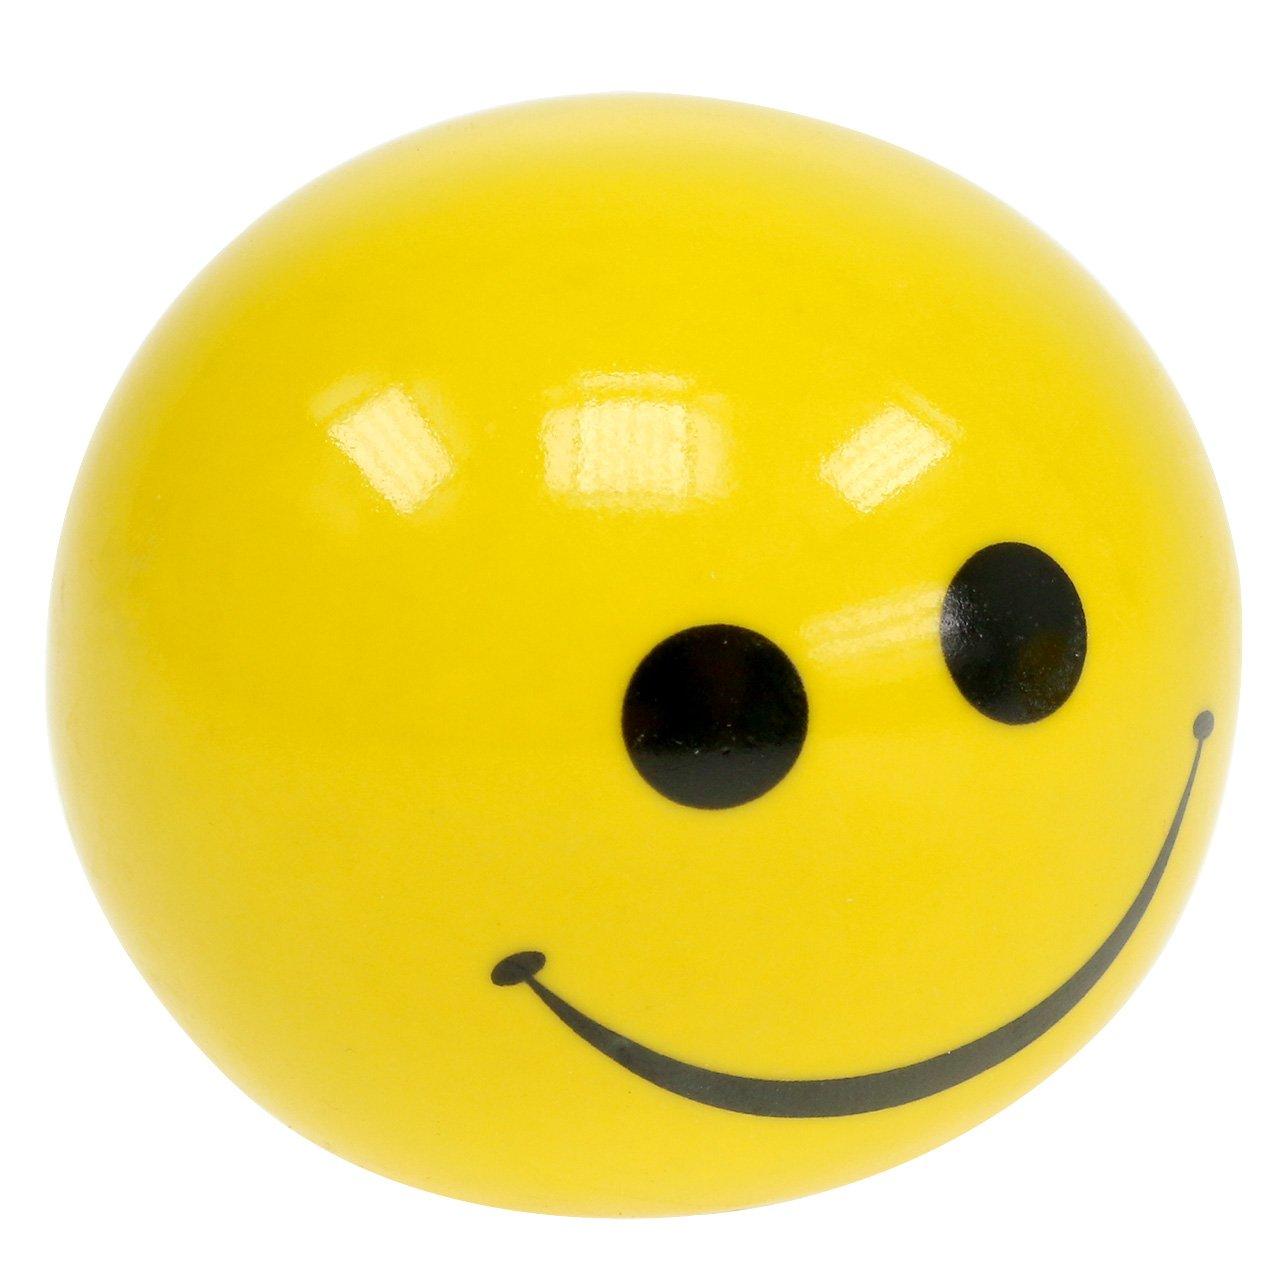 Keramisk kule med Smeili gul Ø5cm H4,5cm 6stk